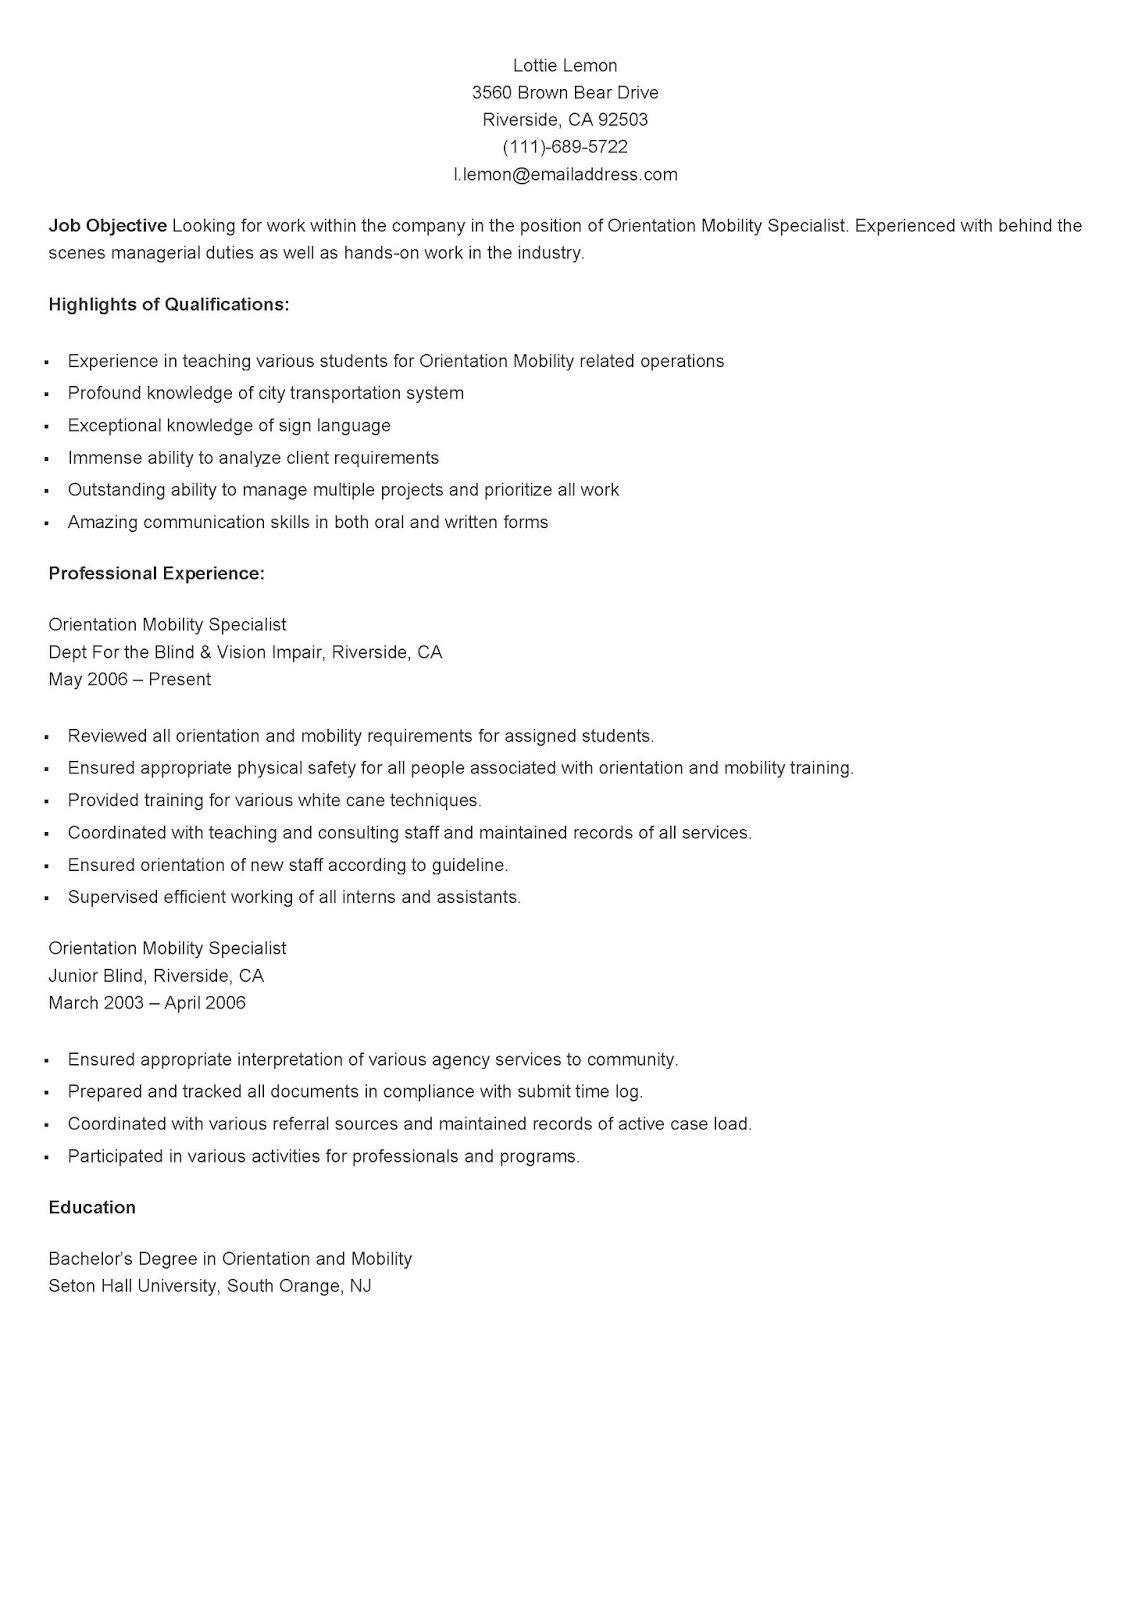 Sample Orientation Mobility Specialist Resume  Resame